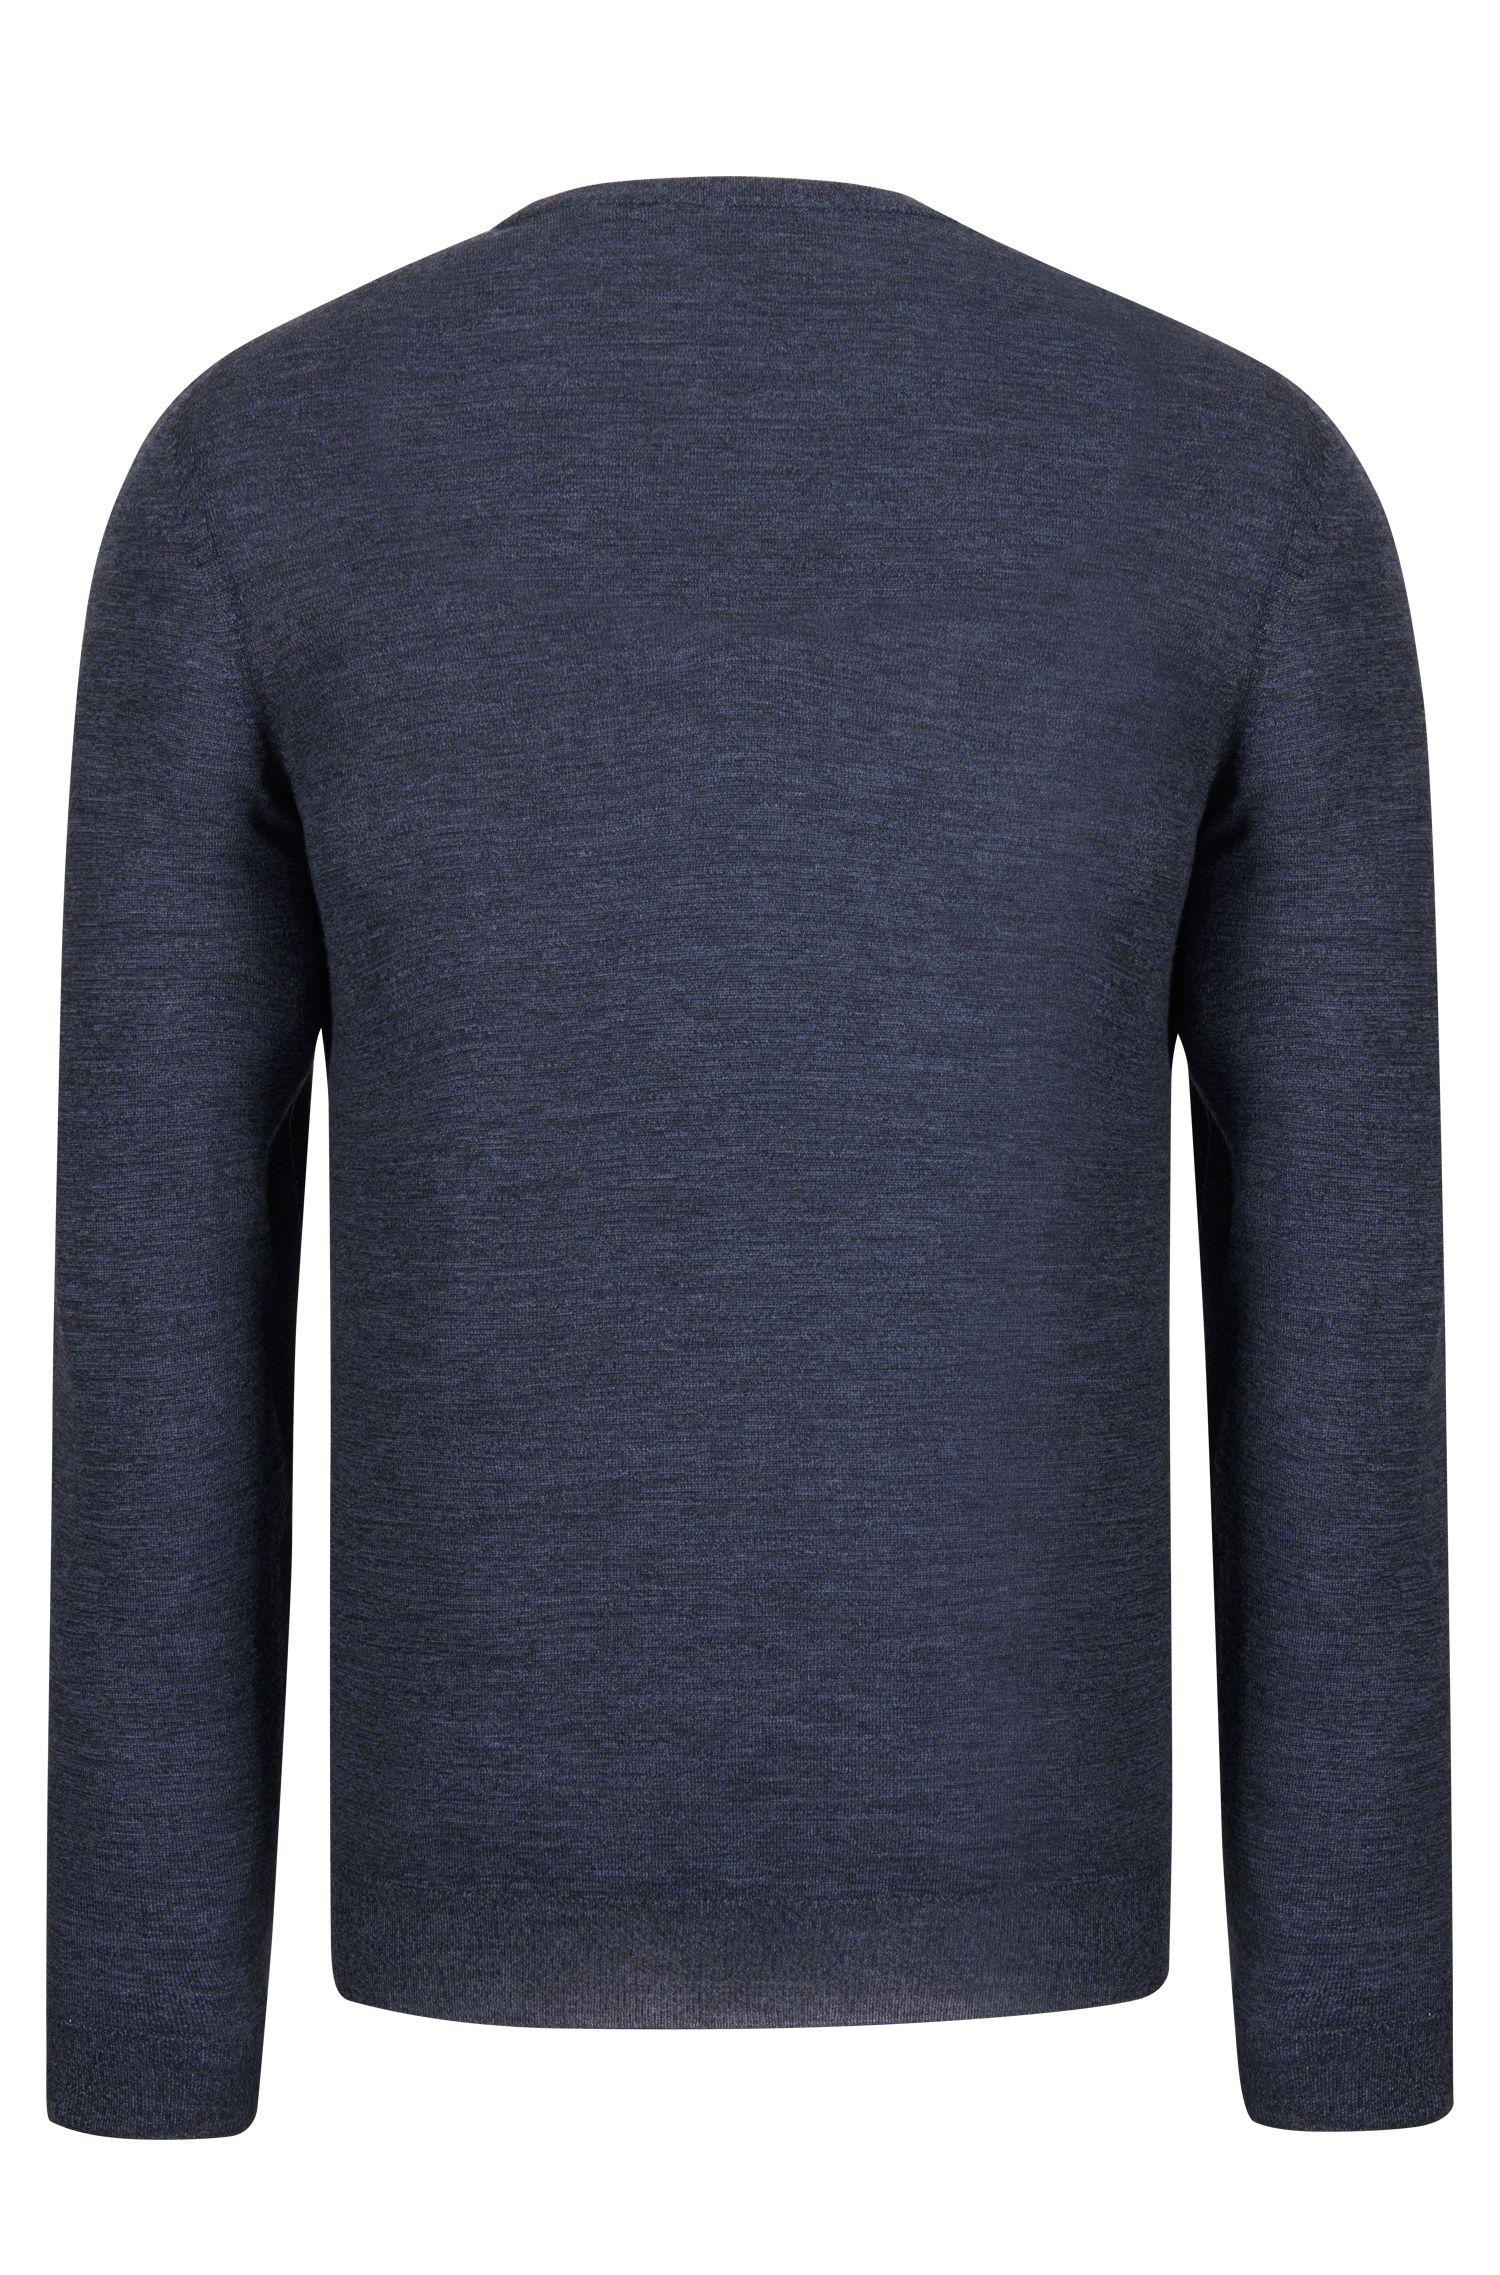 V-Neck Wool Sweater | 'Melba', Dark Blue